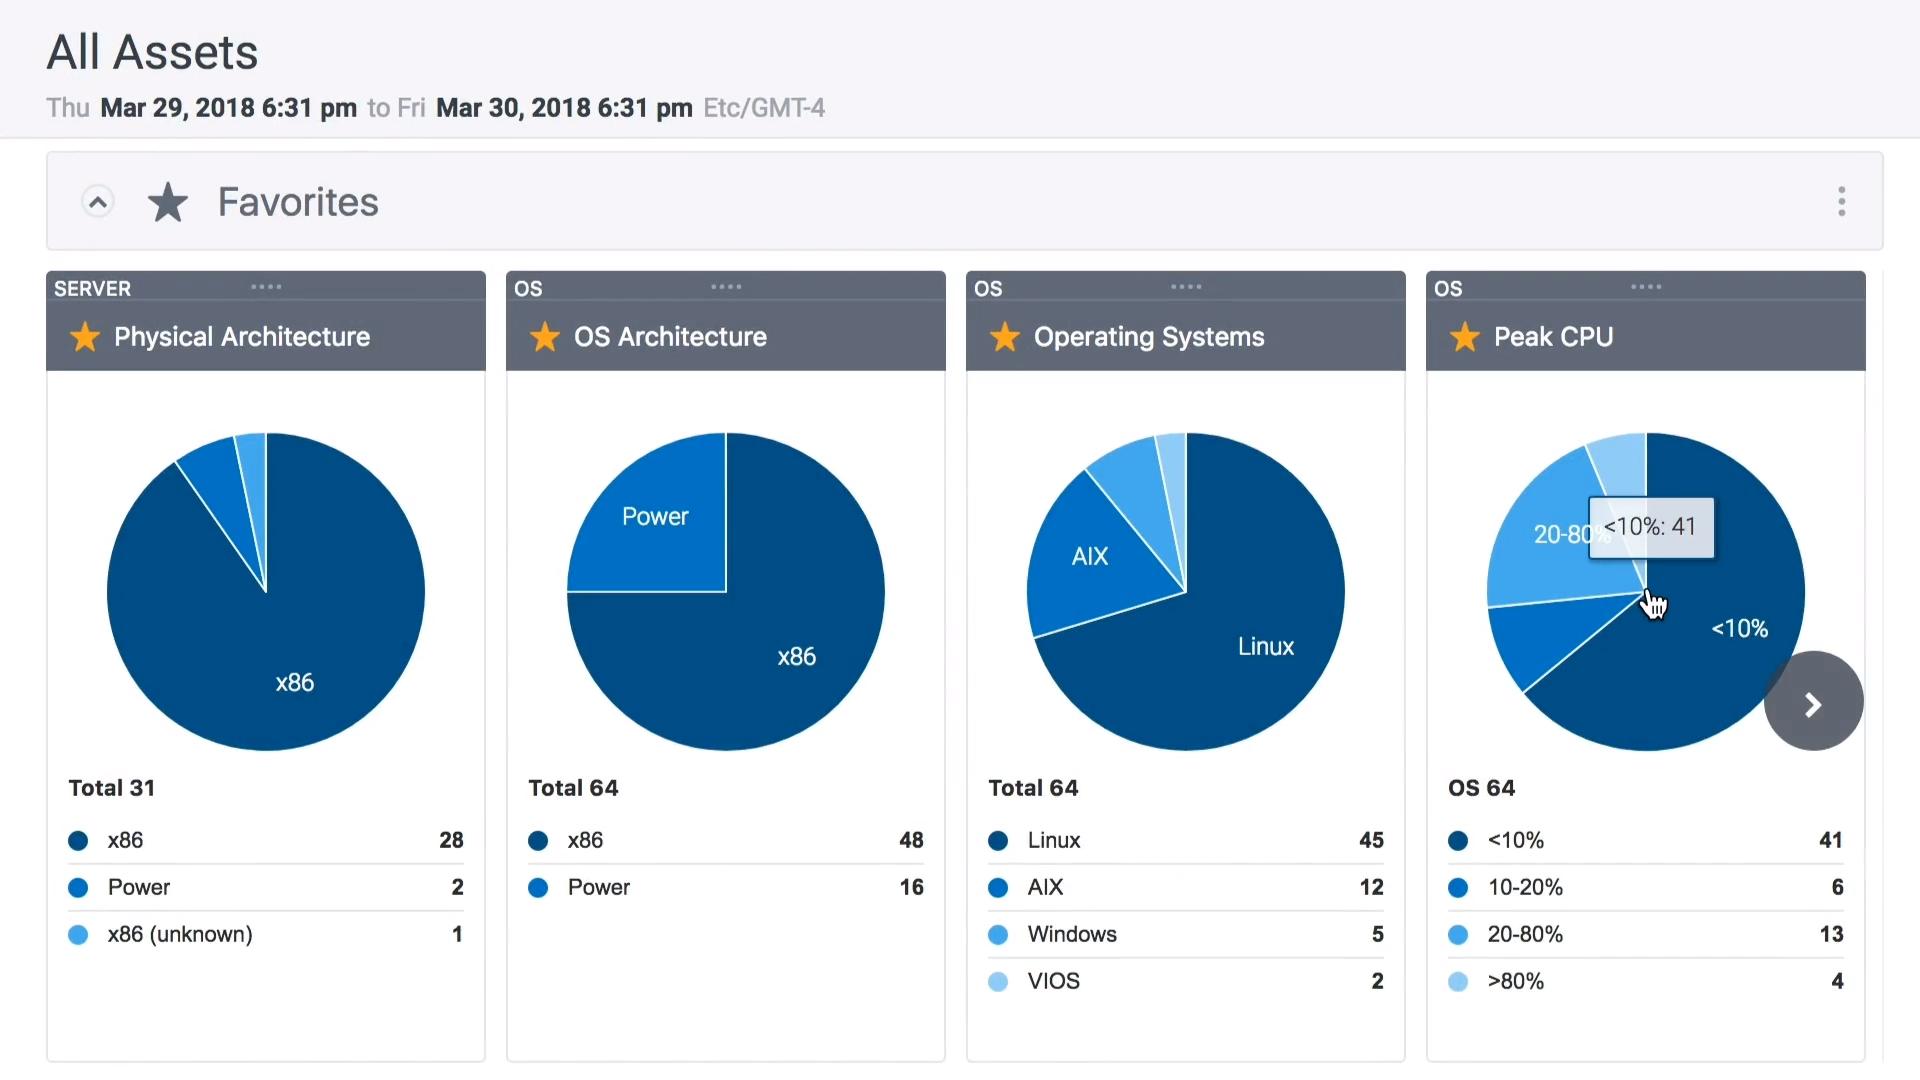 Galileo Performance Explorer asset analytics